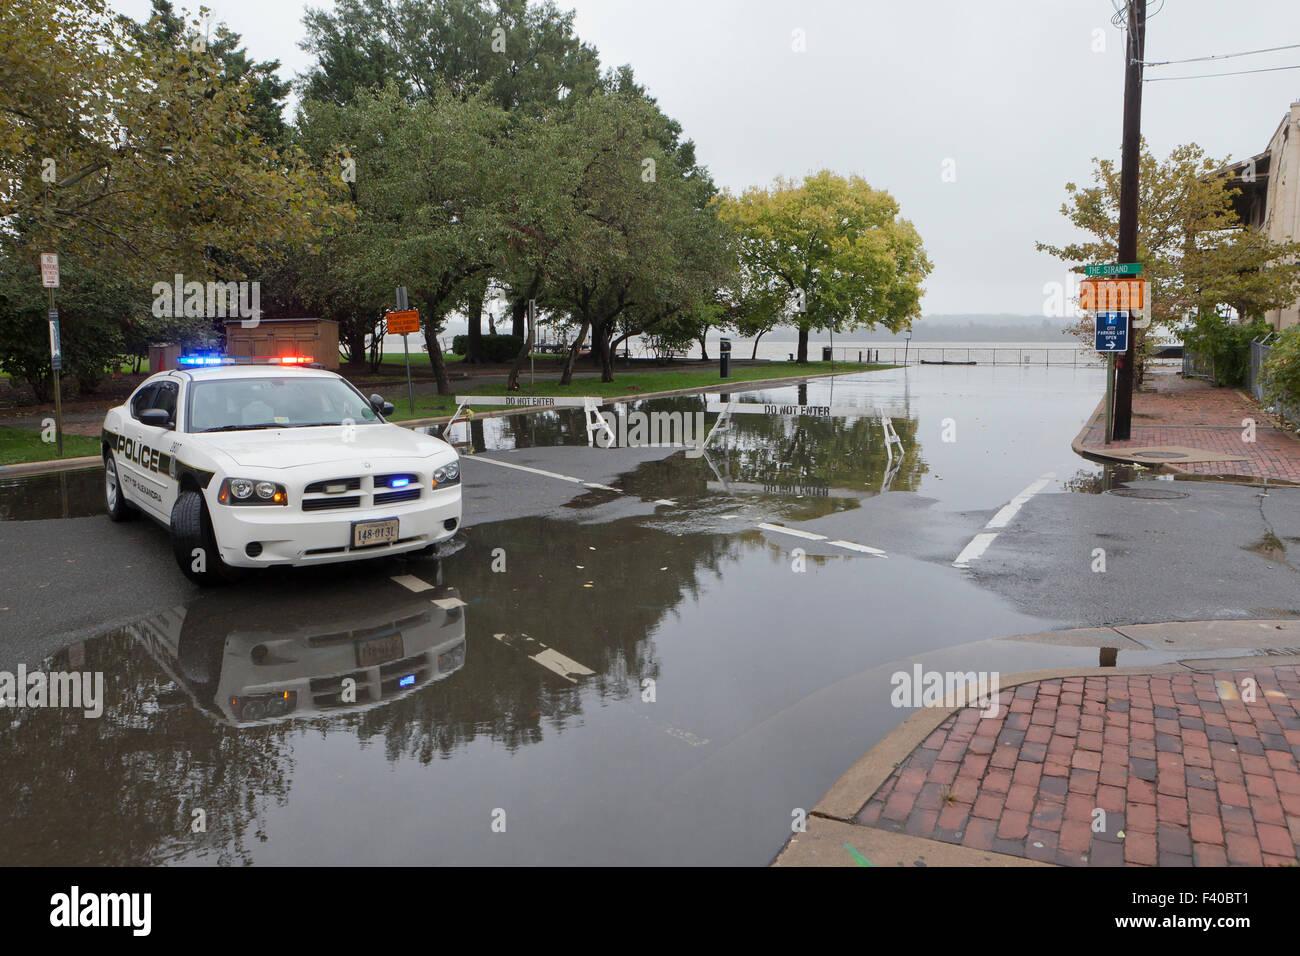 Police car blocking flooded road - Alexandria, Virginia USA Stock Photo